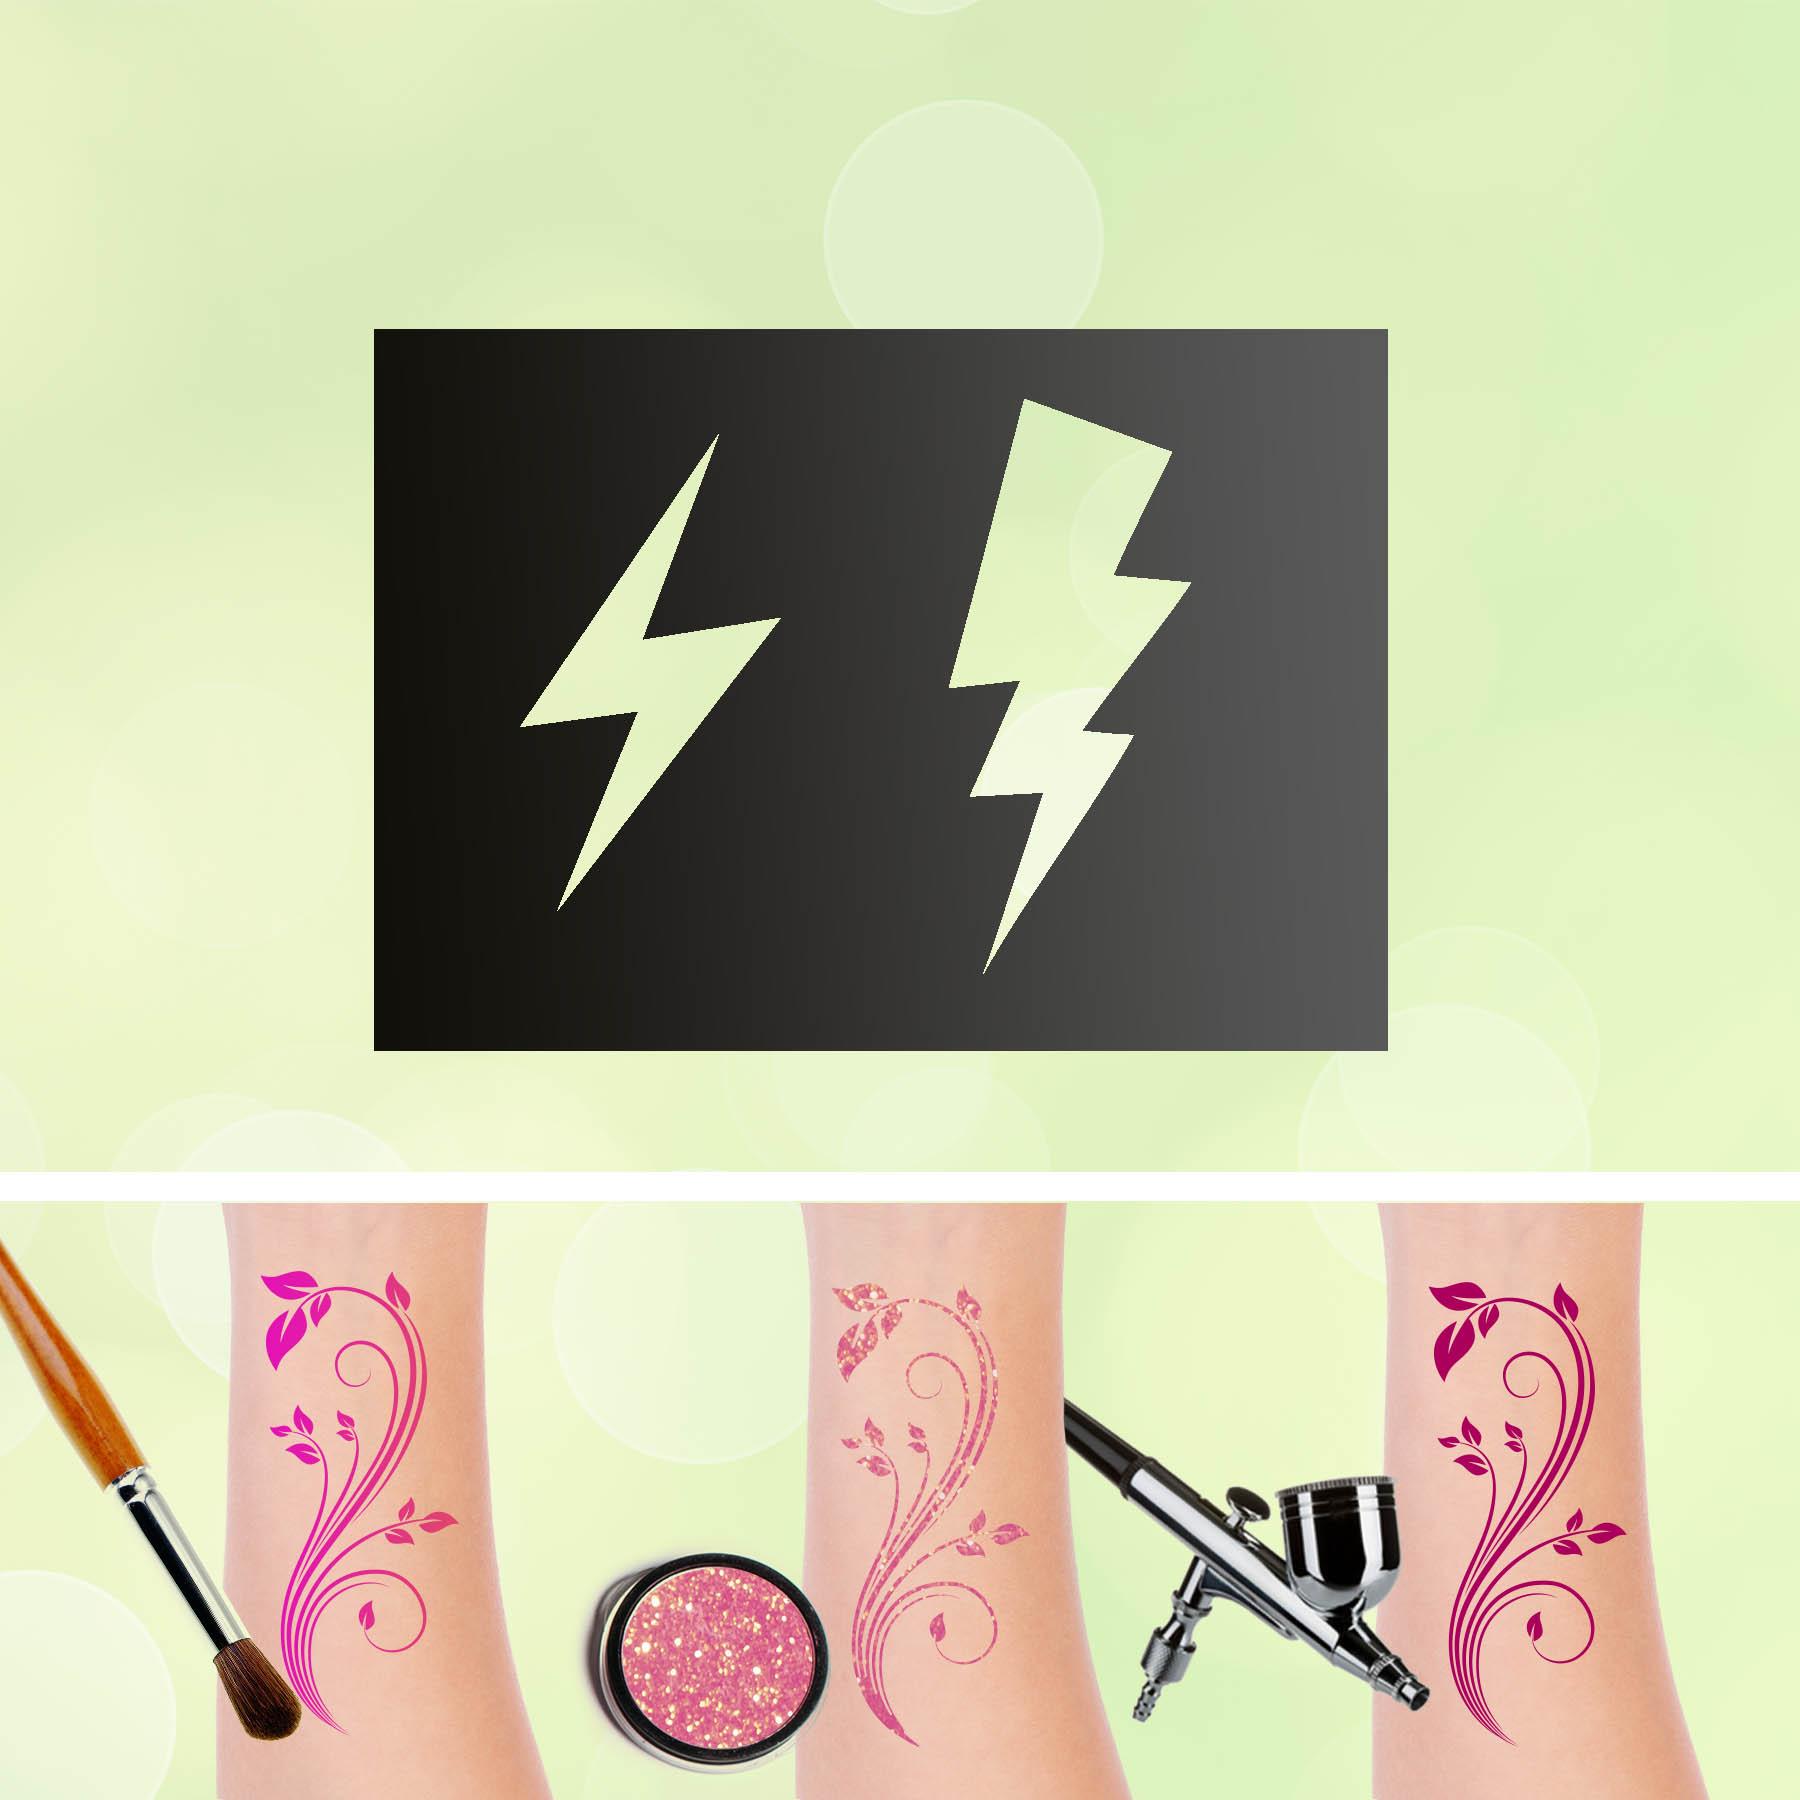 Tattoo Schablonen Blitze Selbstklebend Kinderschminken Airbrush